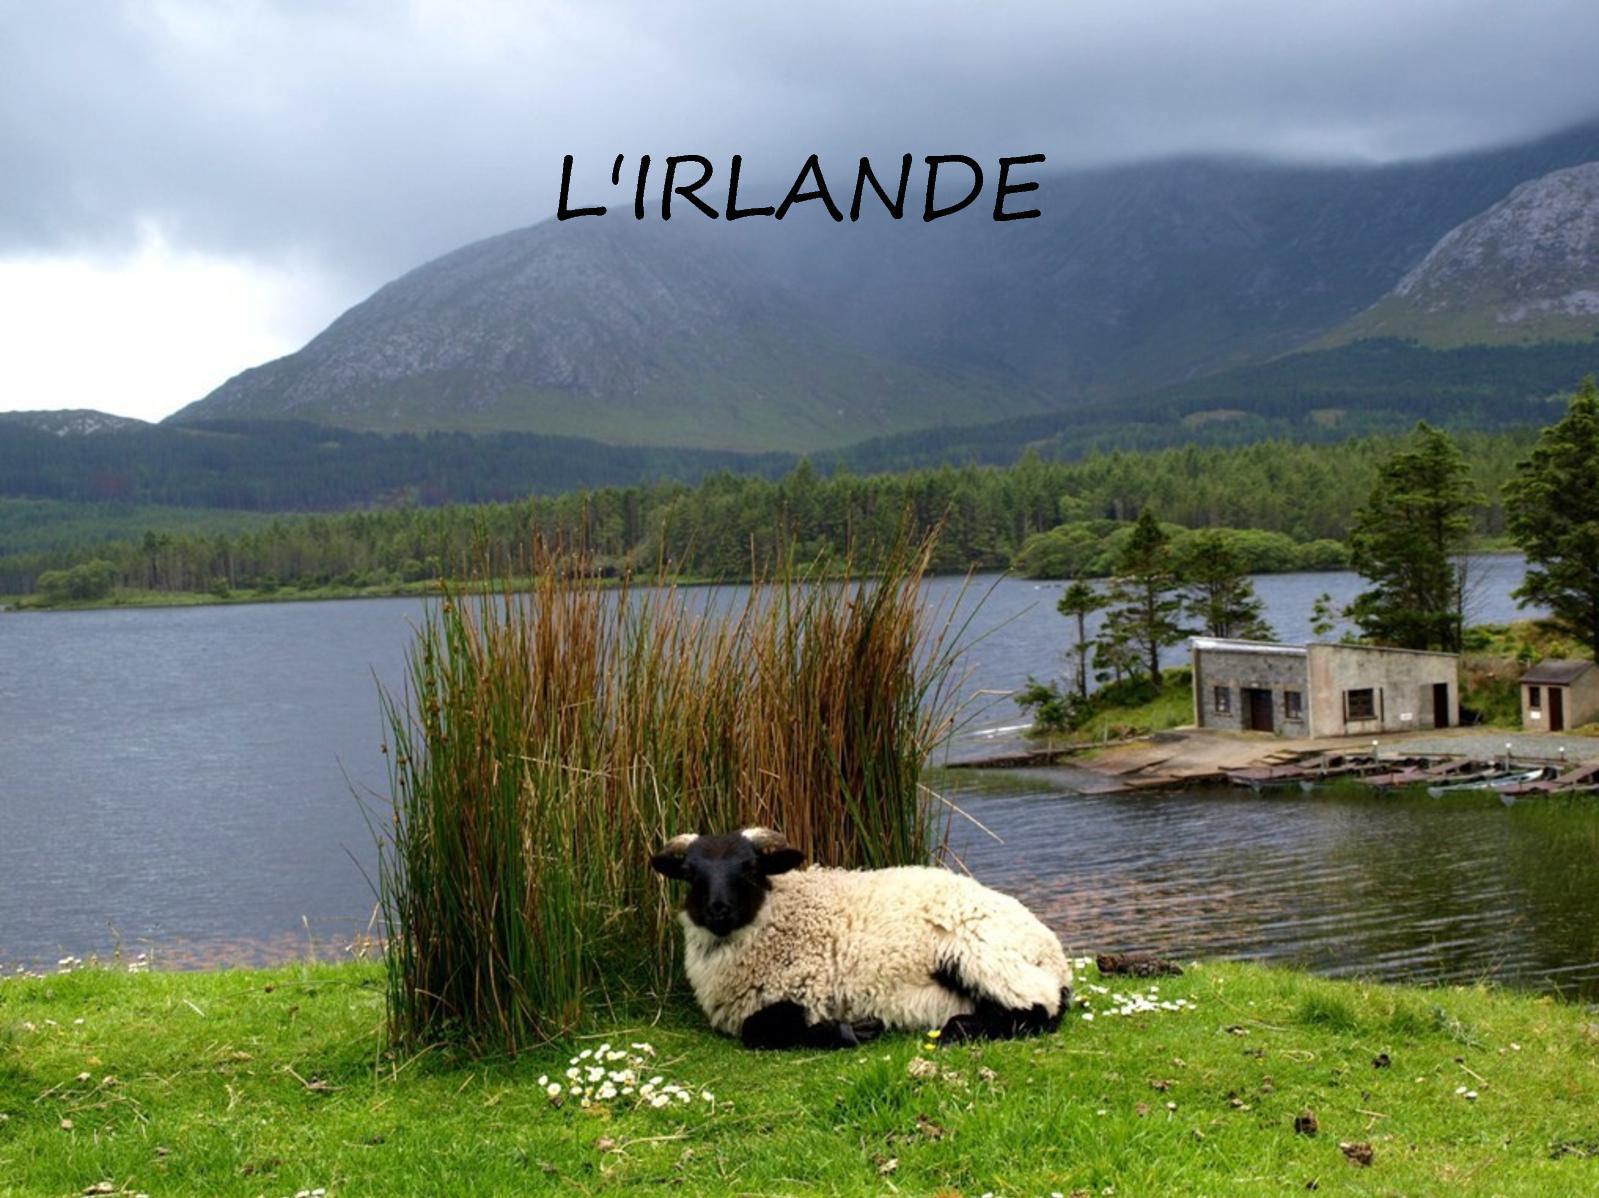 Irlande Clh